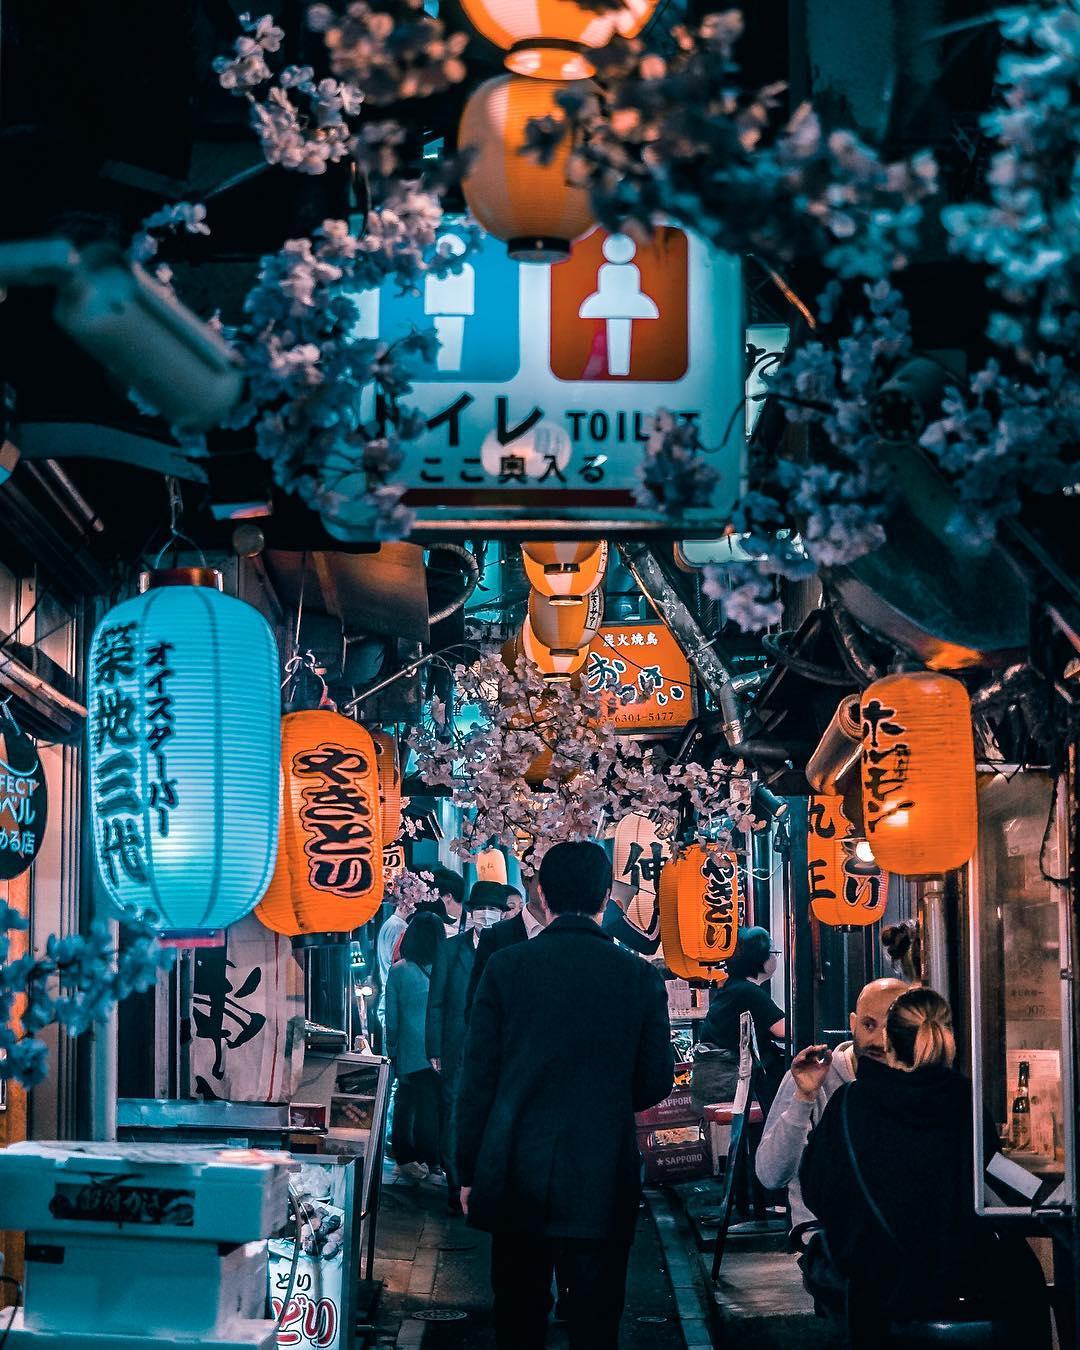 tokyo-nightlife-photography-hosokawa-ryohei-3